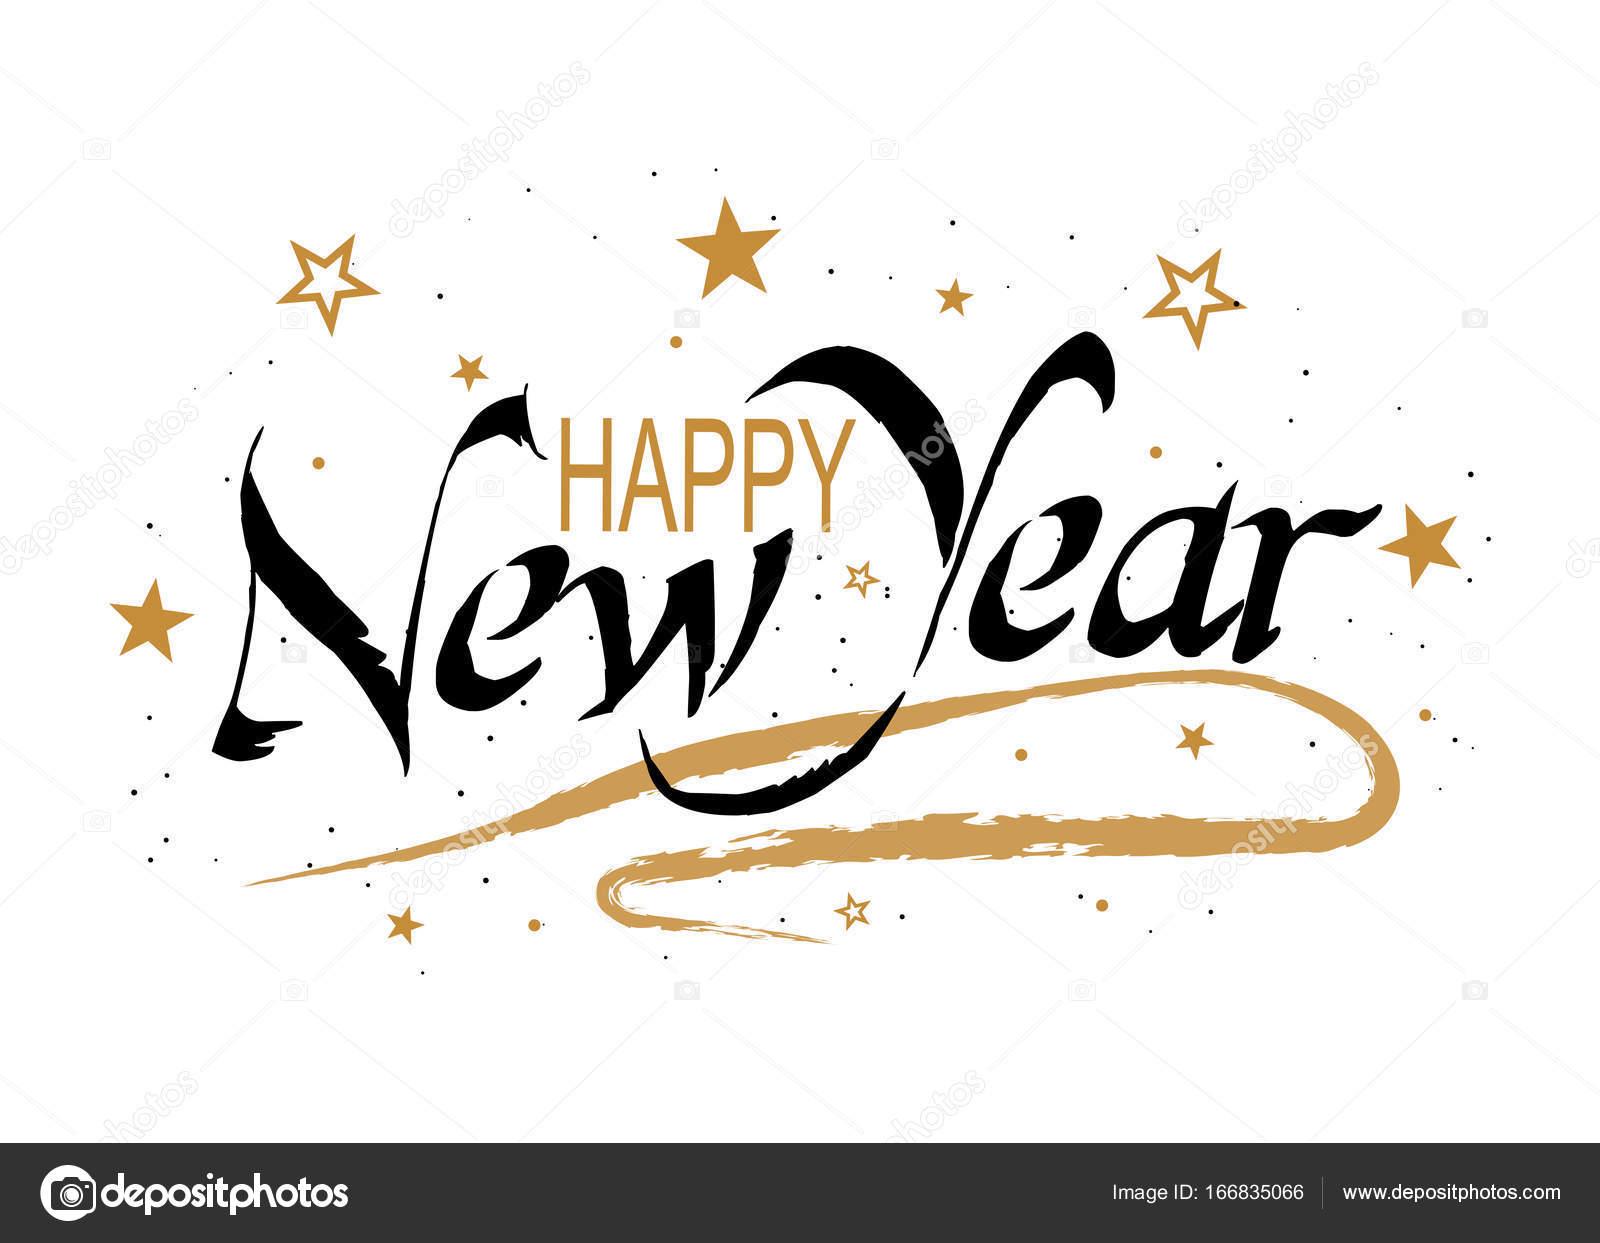 Happy New Year >> Vektor Happy New Year Yazi Yildiz Ve Kar Ile Tatil Hat Afis Poster